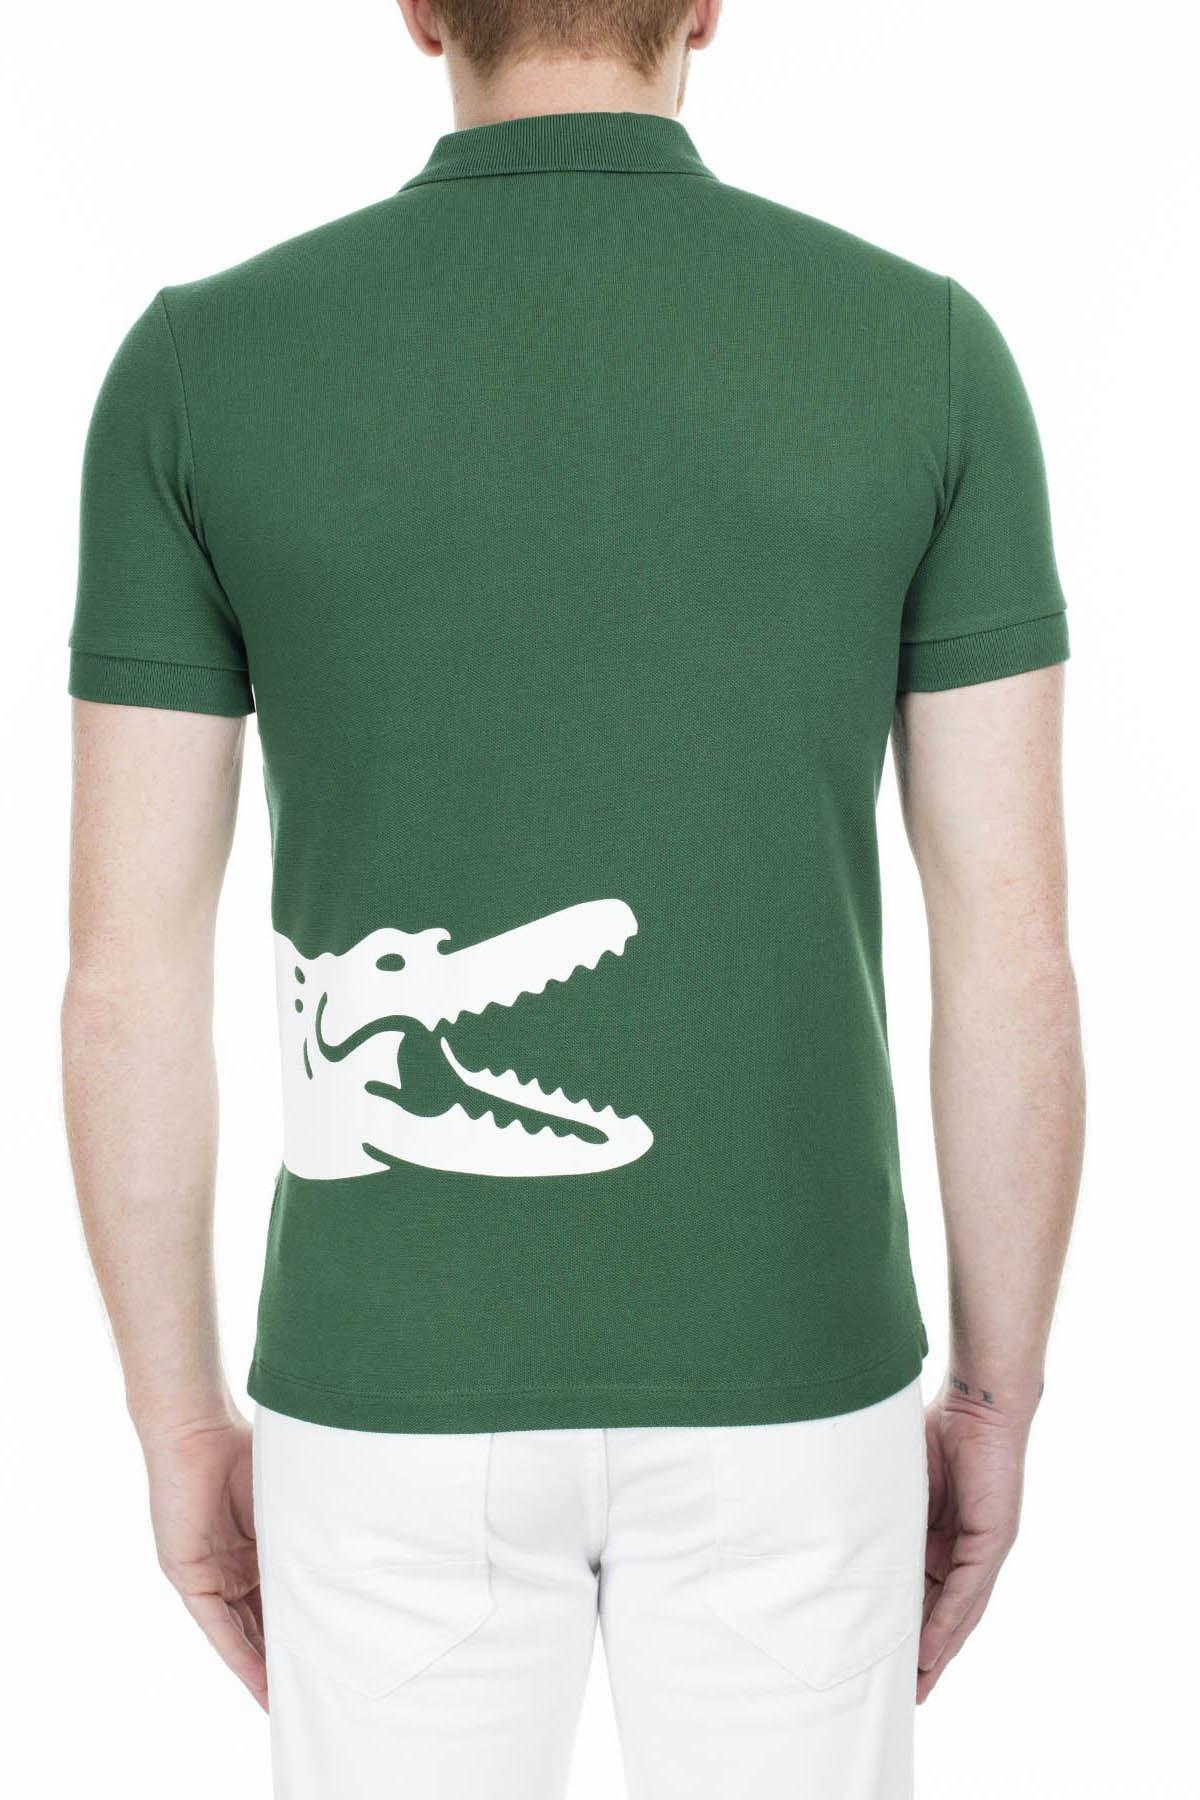 Lacoste T Shirt Erkek Polo PH5284 132 YEŞİL